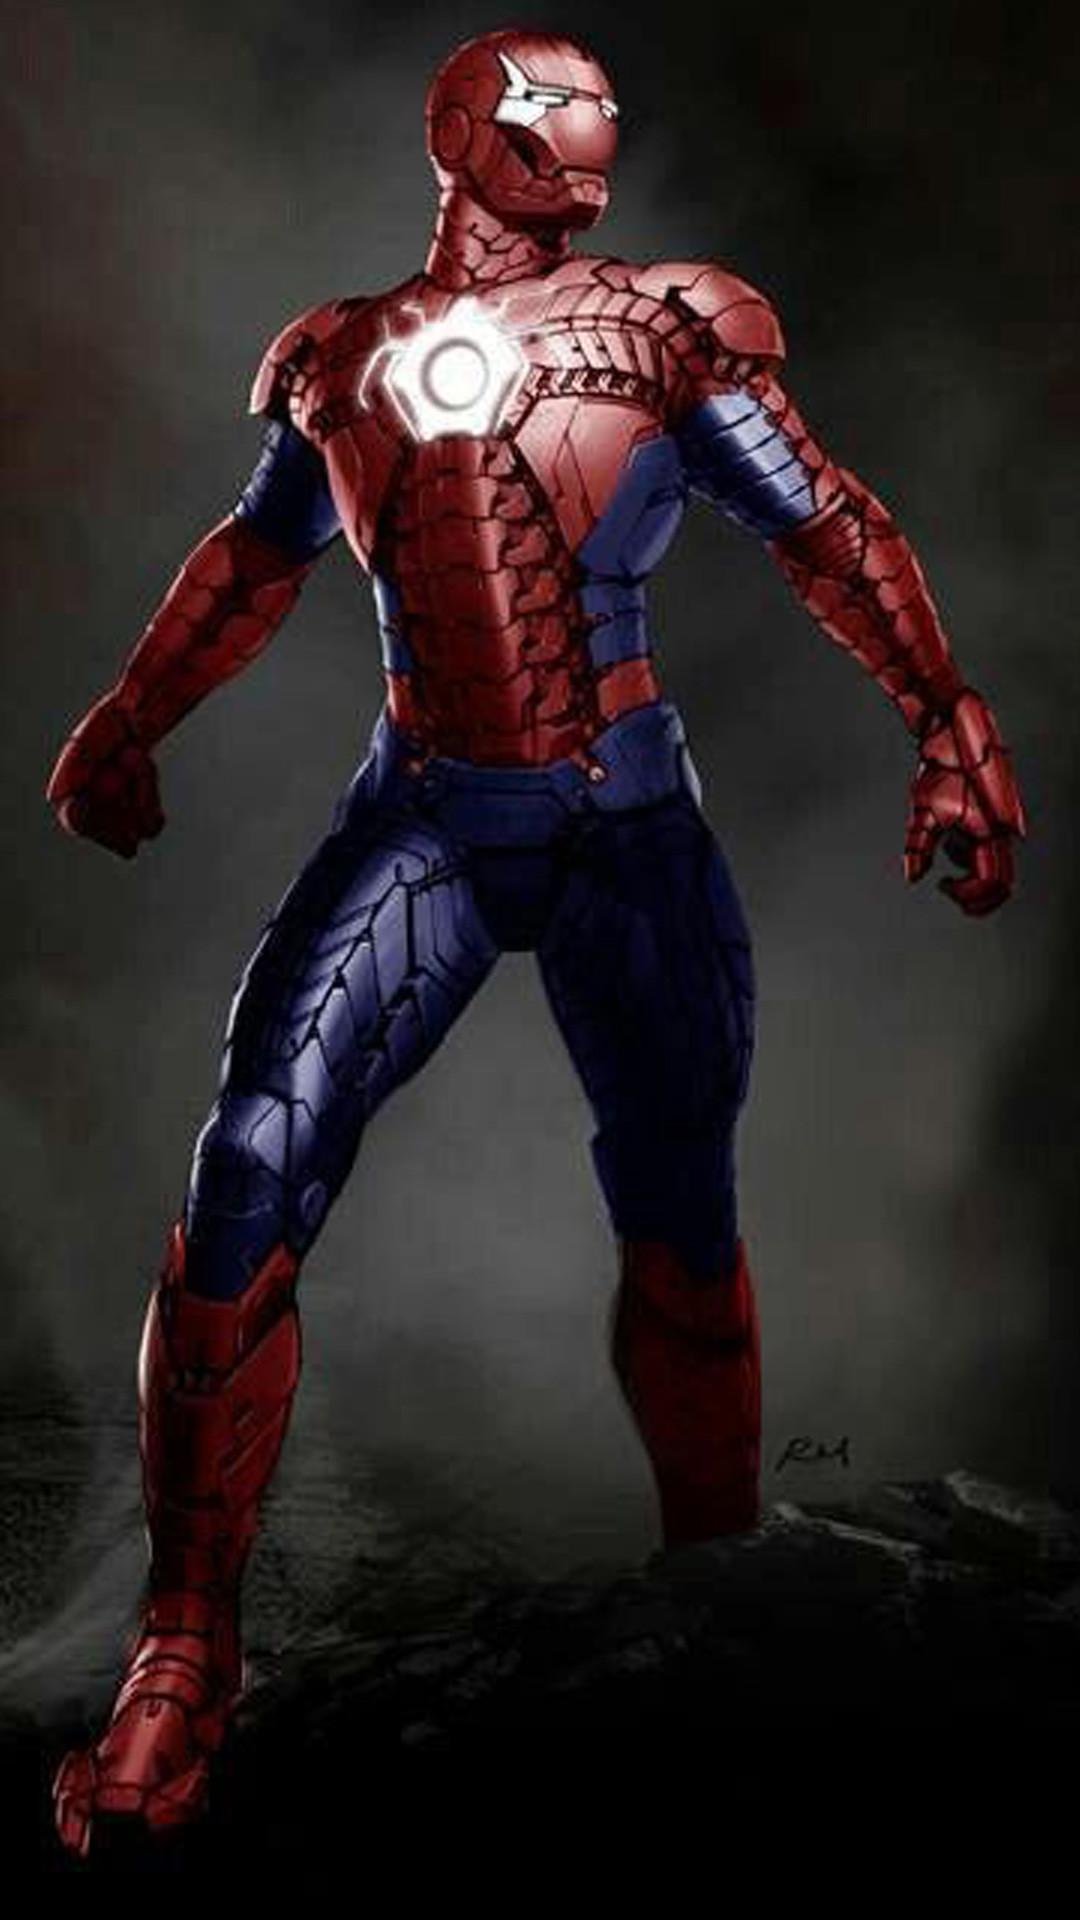 Animated Spider Wallpaper Sfondi Iron Man 84 Immagini